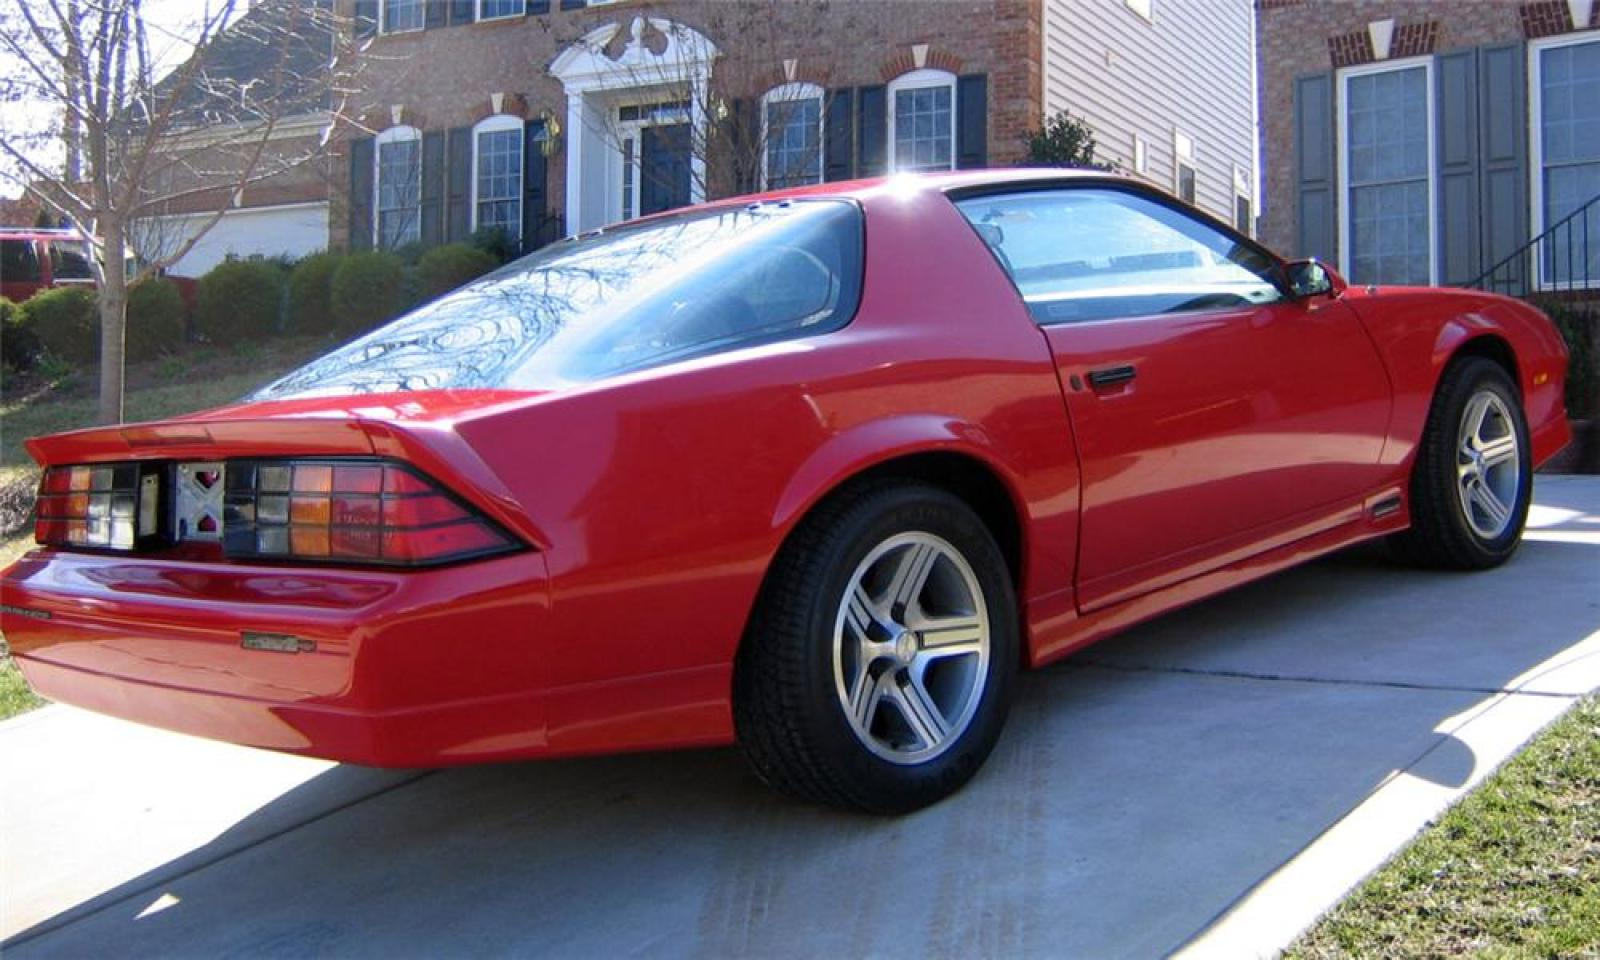 1990 Chevrolet Camaro - Information and photos - Zomb Drive